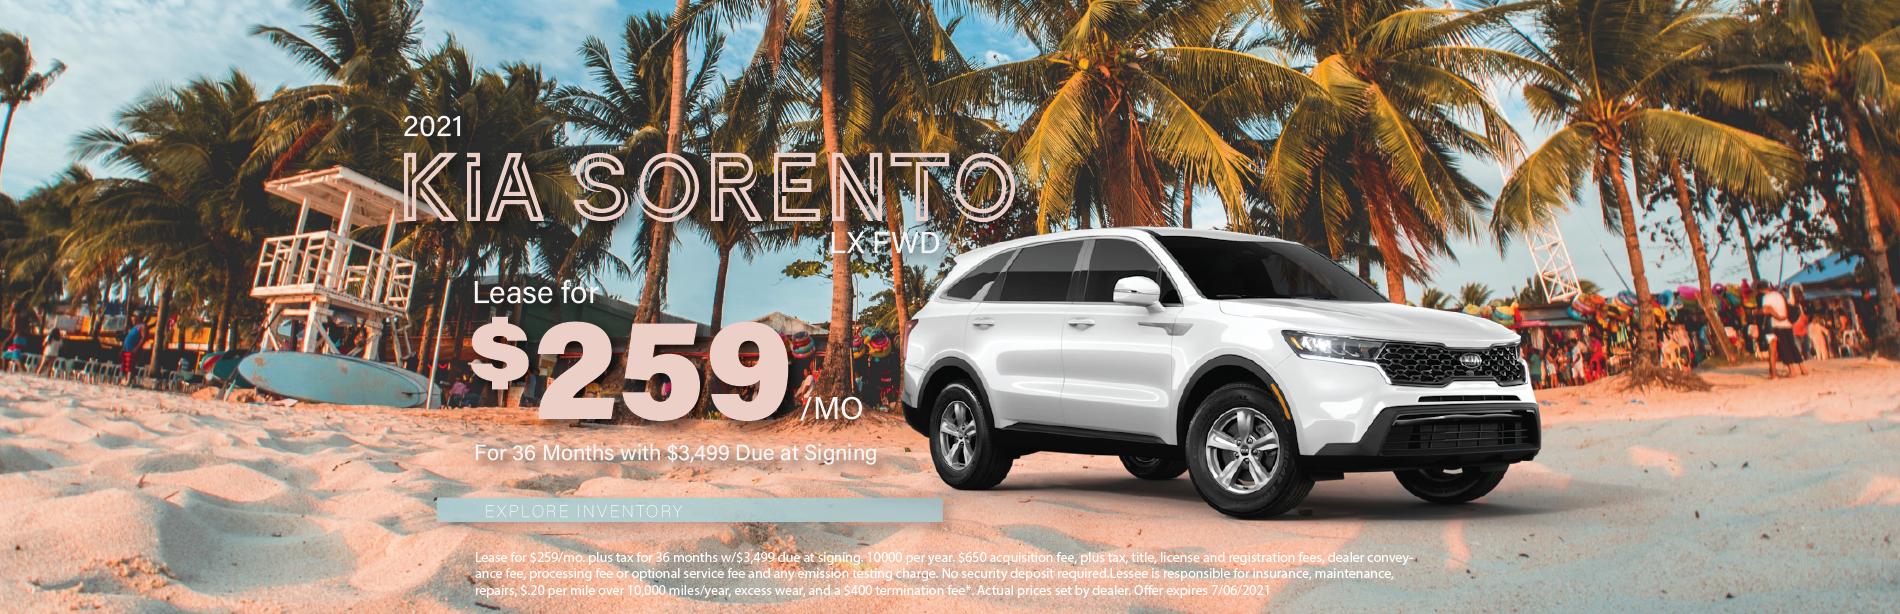 Lafontaine Kia Sorento updated – May